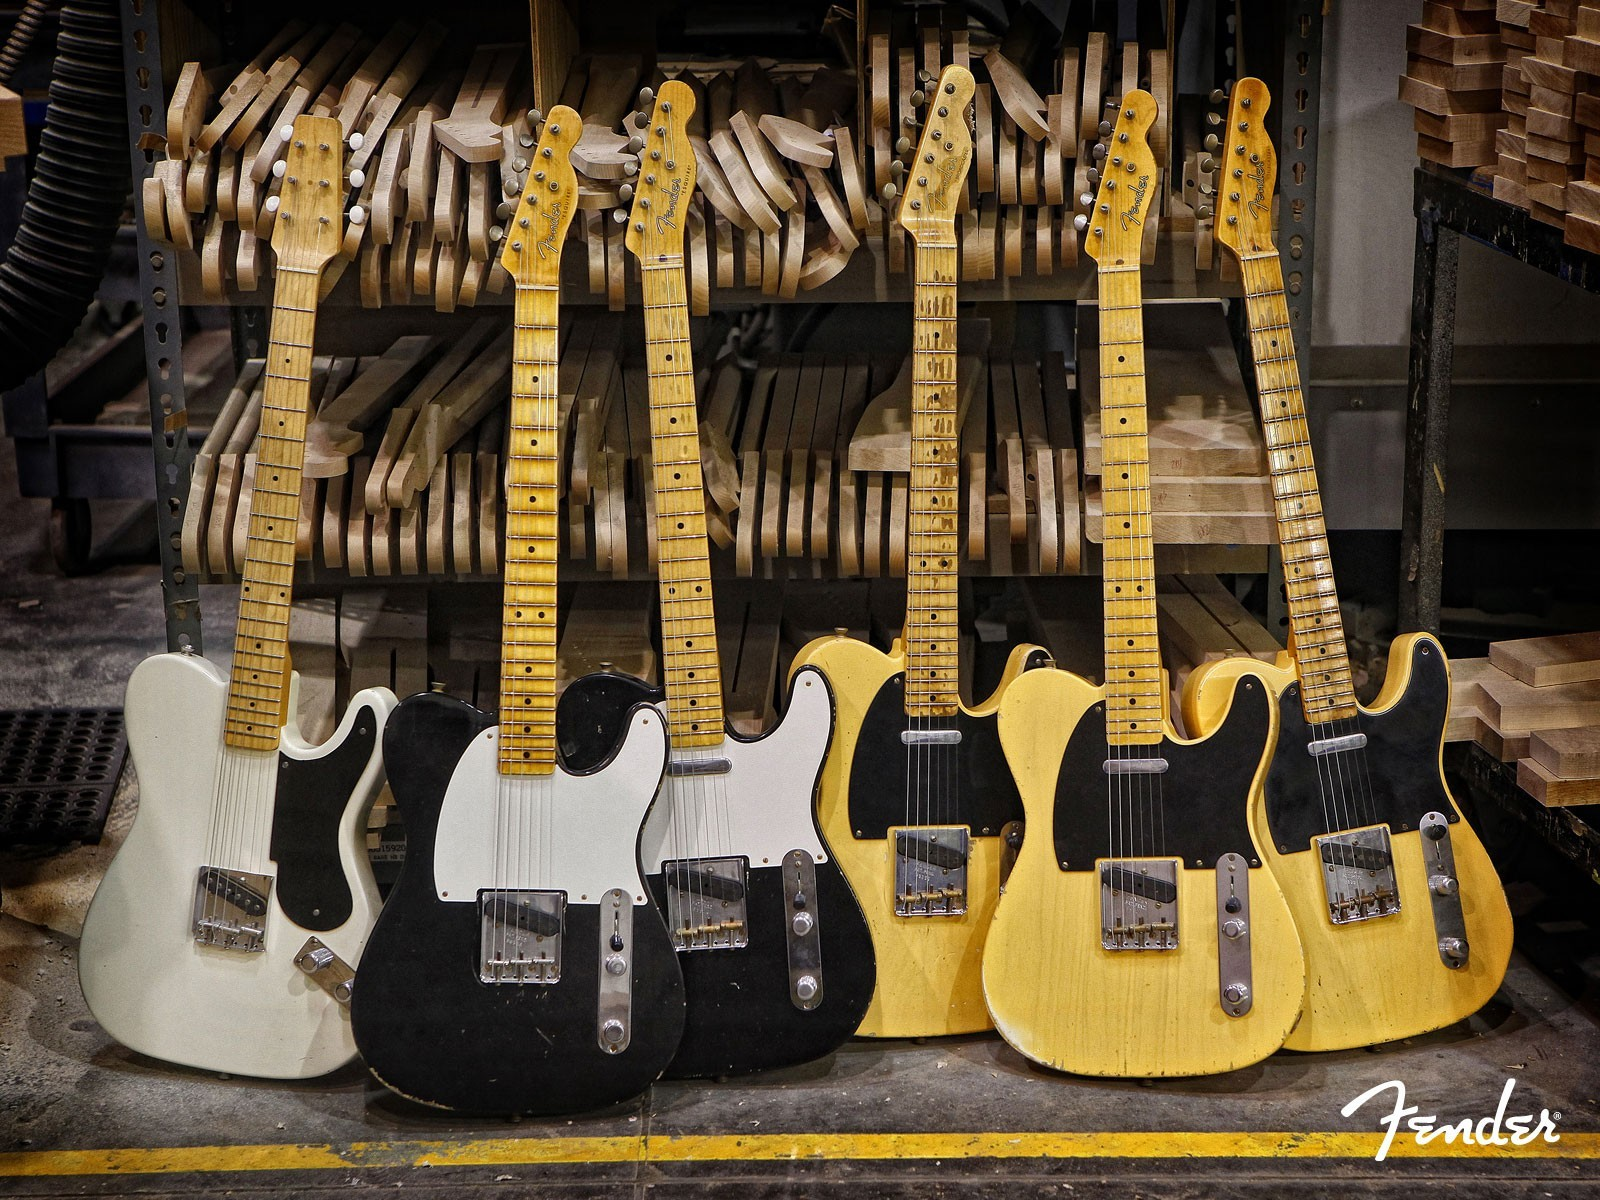 Fender telecaster esquire guitar electric wallpaper   ForWallpaper 1600x1200